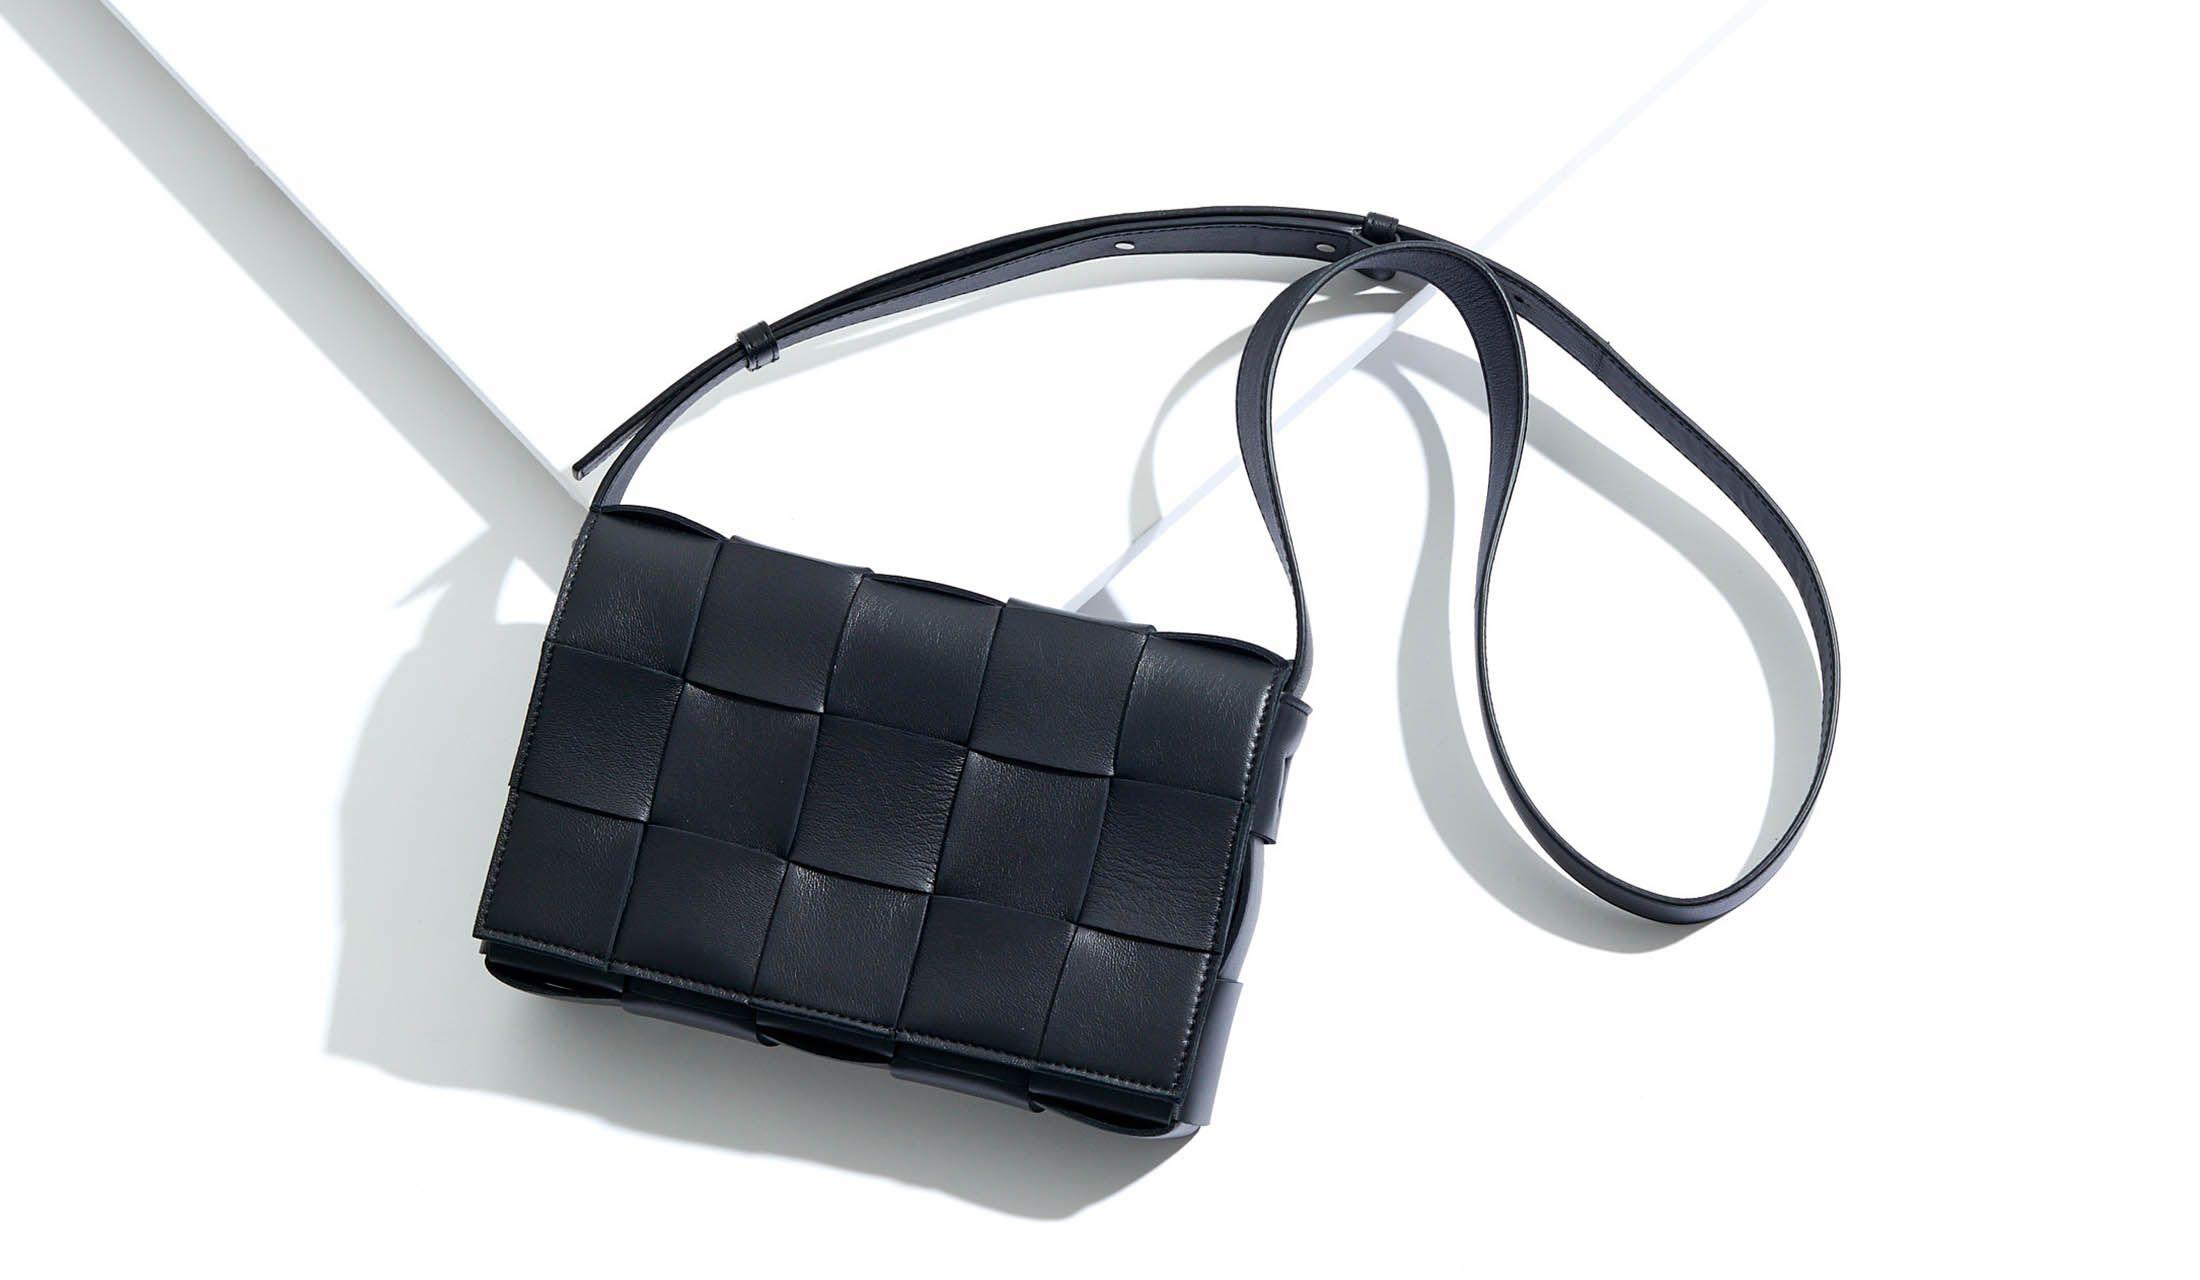 BOTTEGA VENETA(ボッテガ・ヴェネタ)のバッグ「カセット」